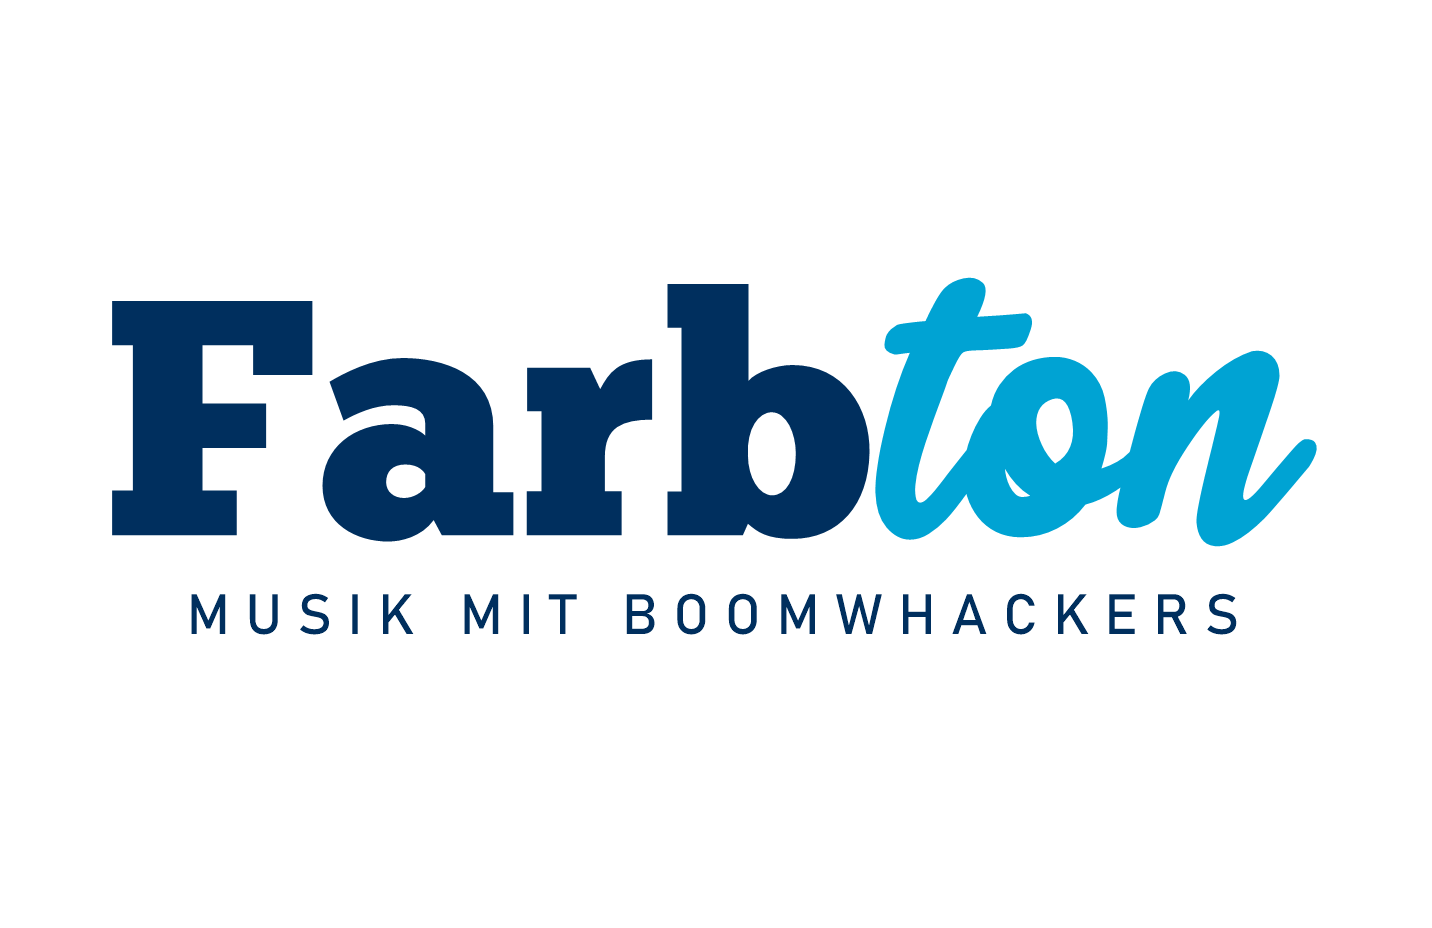 Fanfarenzug-Academy-Farbton-Boomwhackers